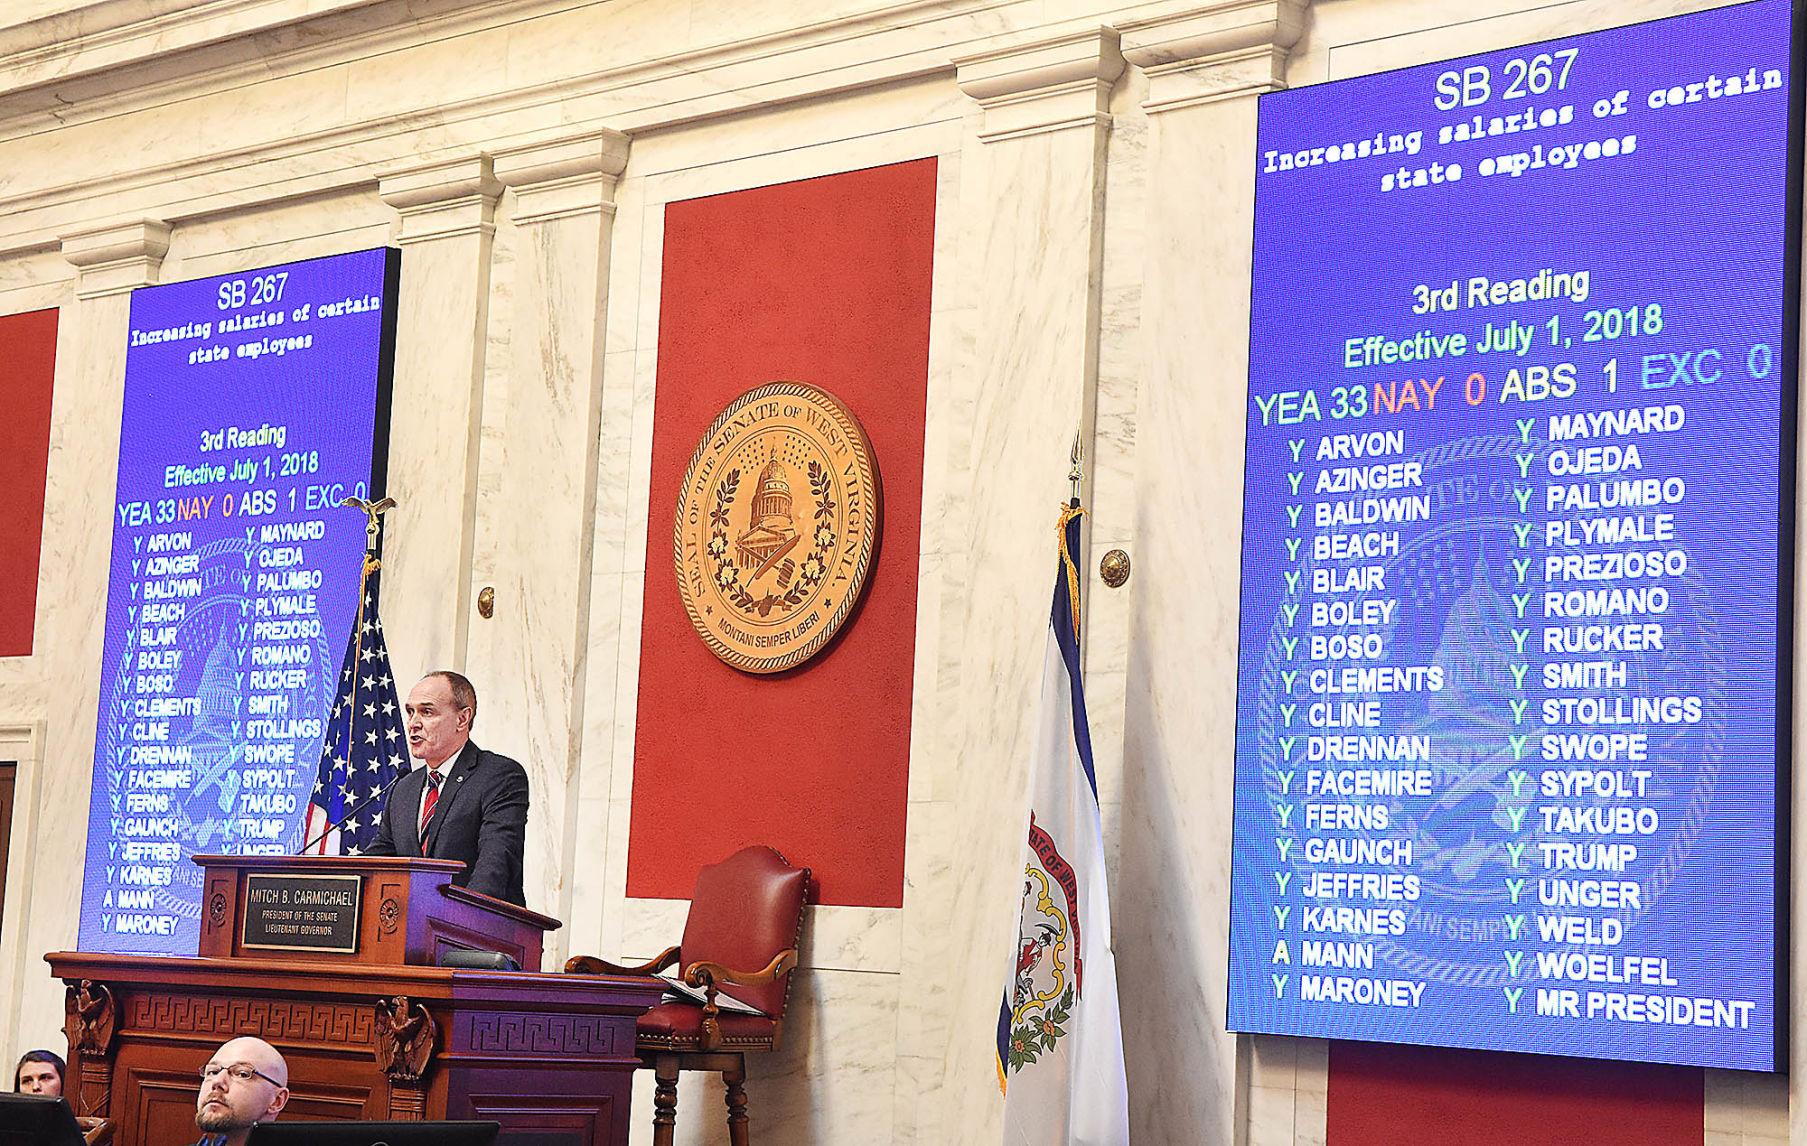 Senate unanimously passes teacher pay raise bill